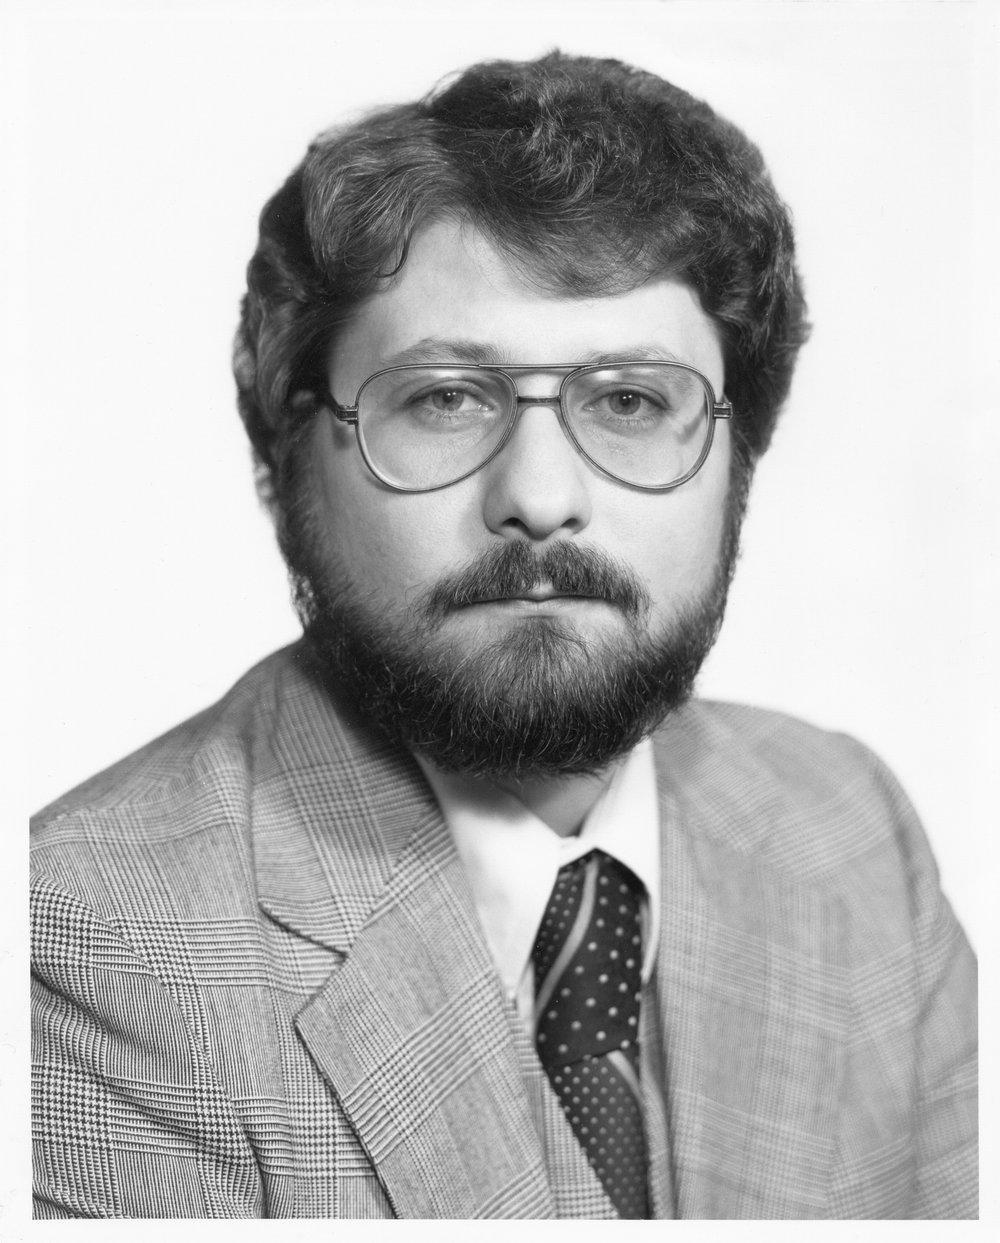 James D. Martin, President of JDM & Associates Marketing LLC